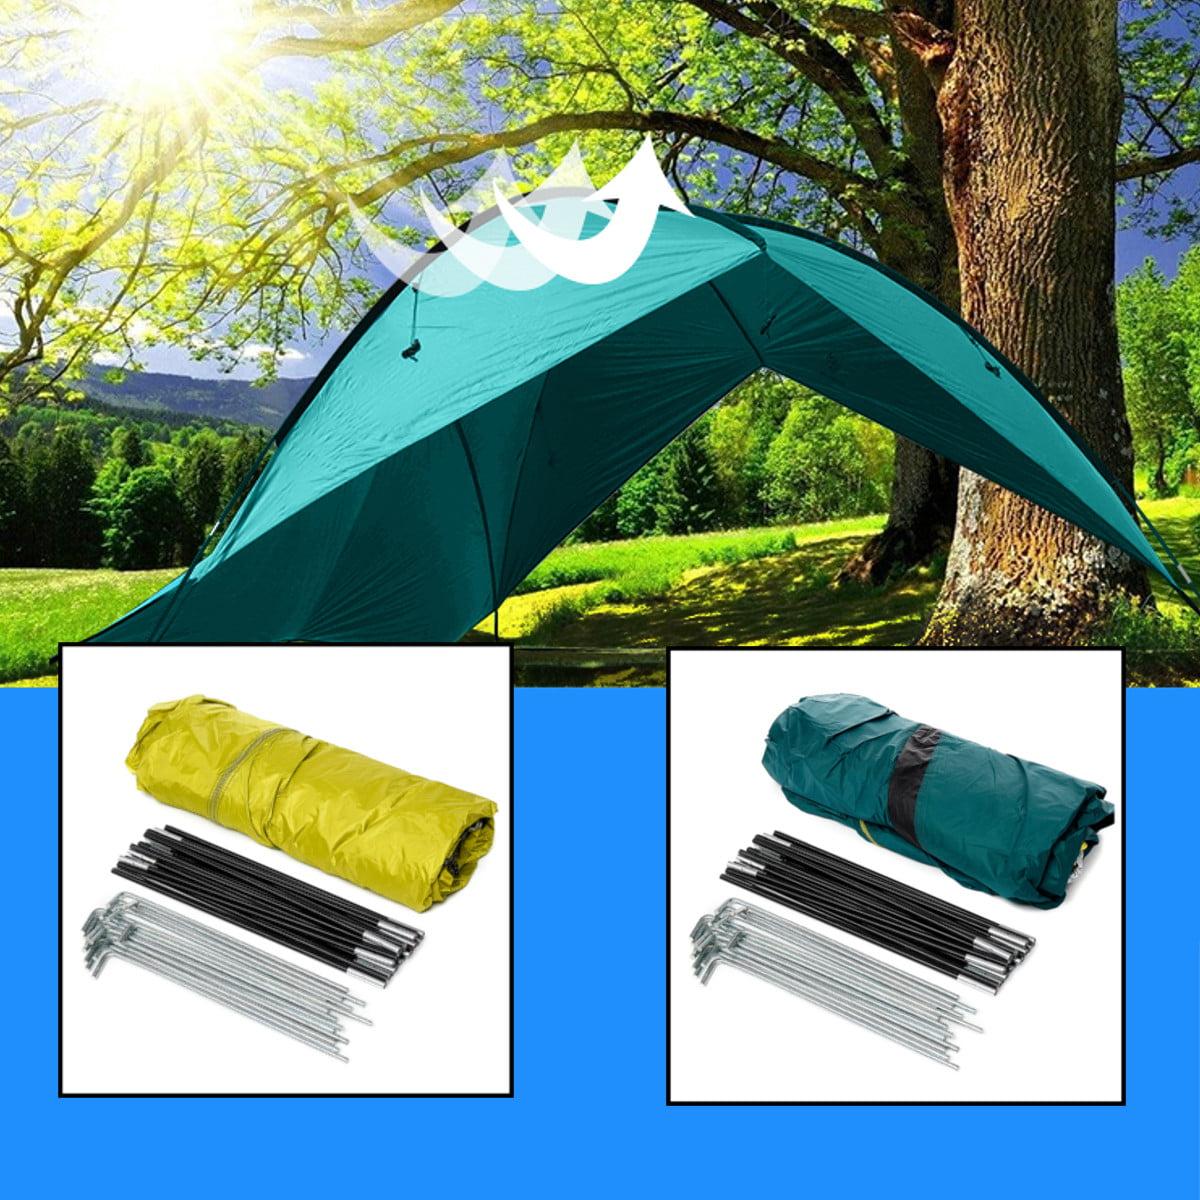 Portable Outdoor Camping Pad Canopy Tent Shelter Tarp Sun Shade Waterproof